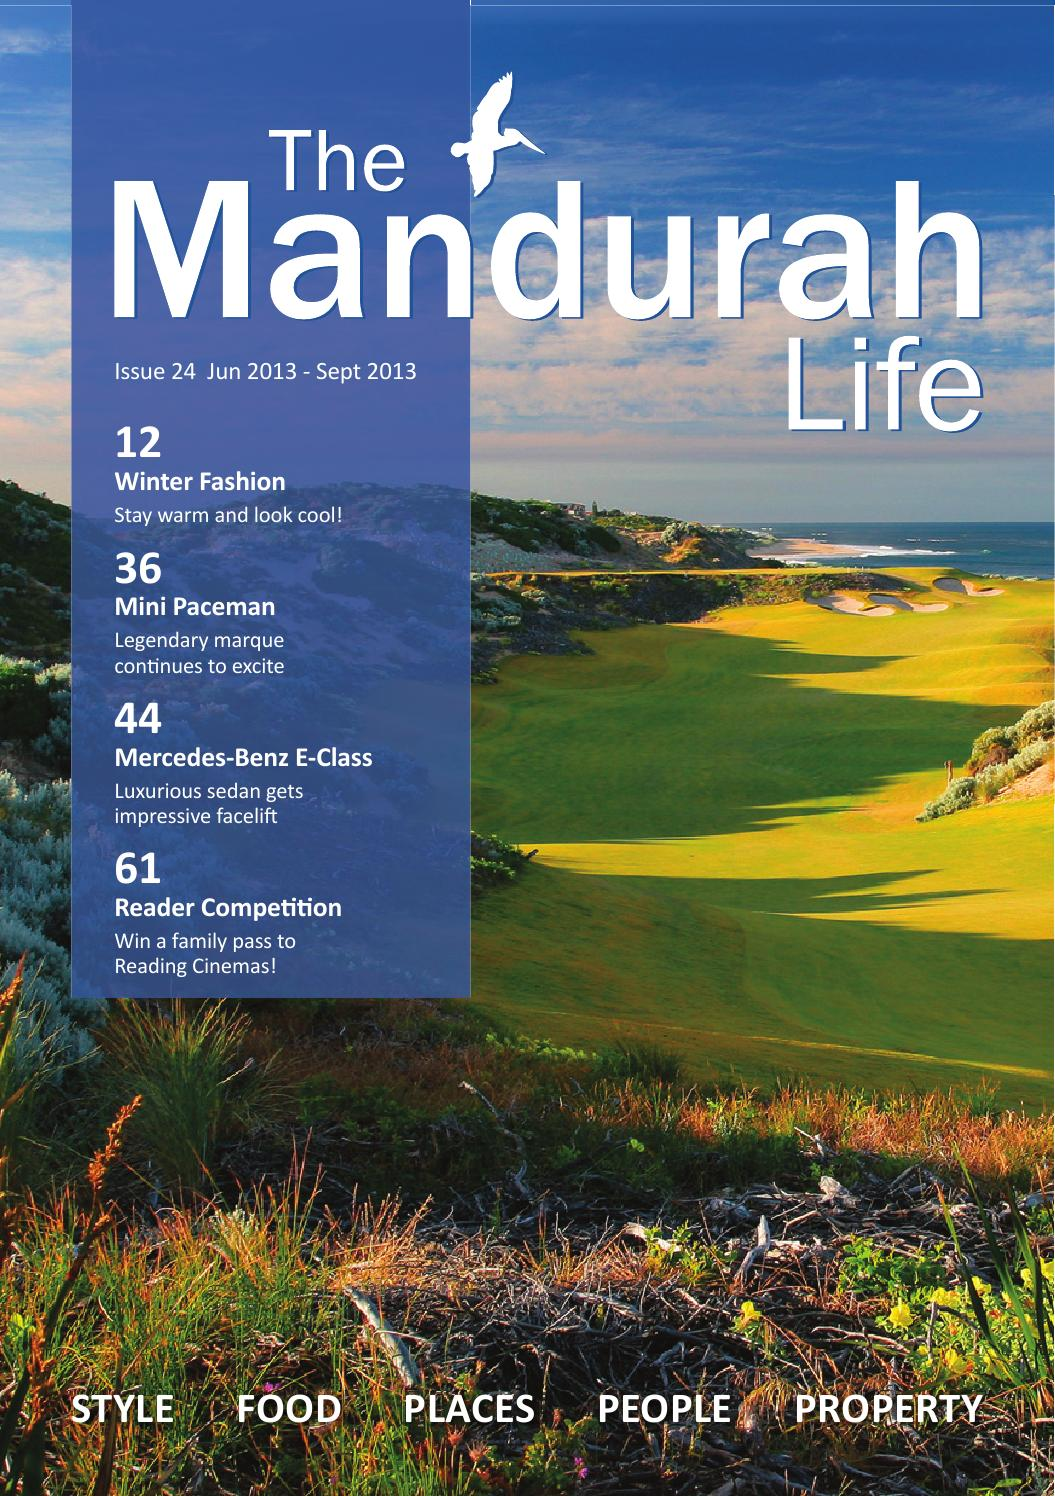 The Mandurah Life - Issue 24 by Blue Sky Media - issuu